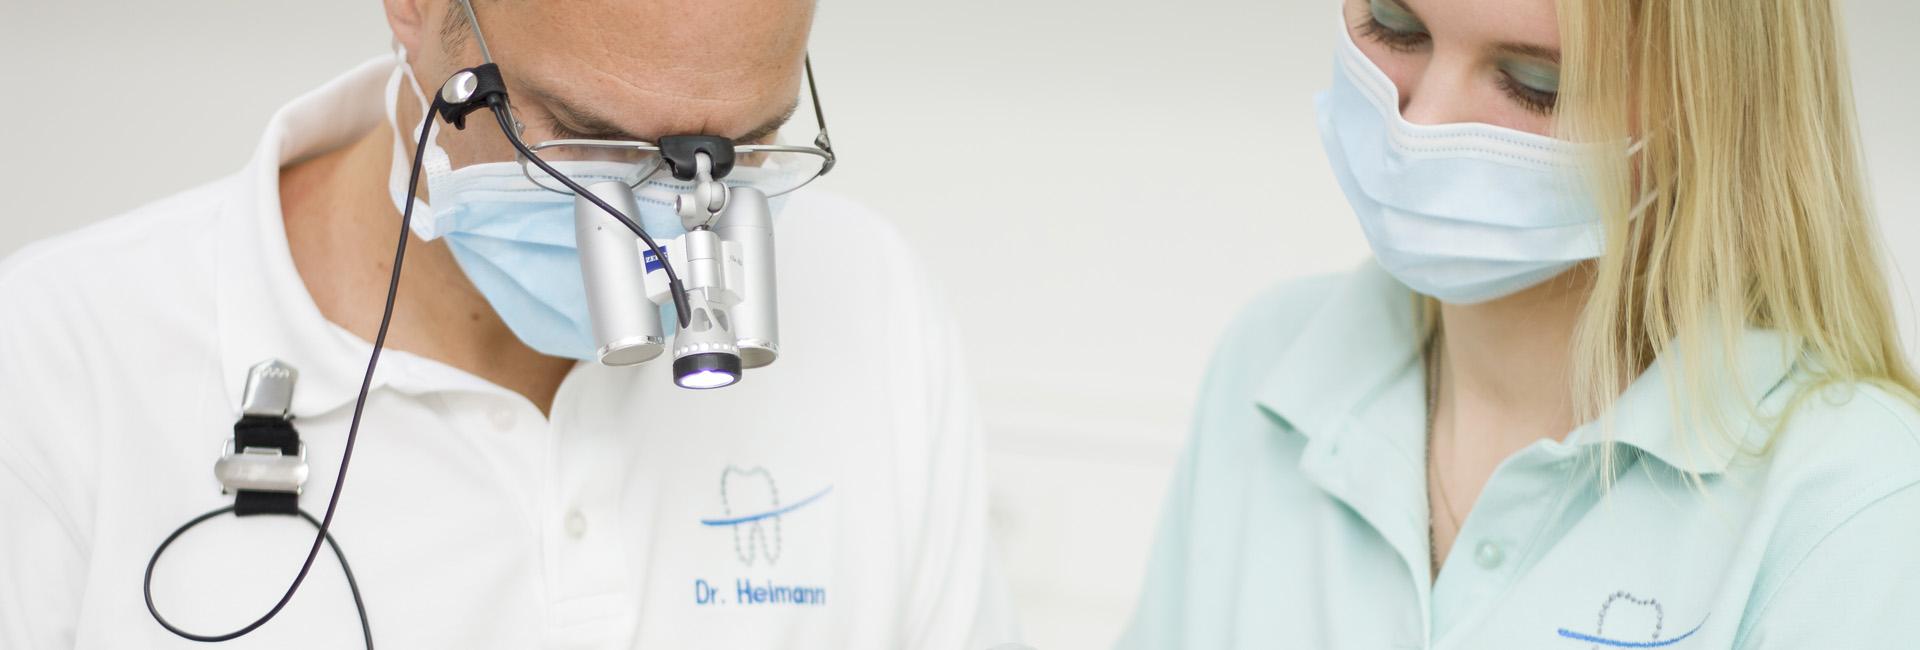 Moderne Zahnmedizin - Laserbehandlung